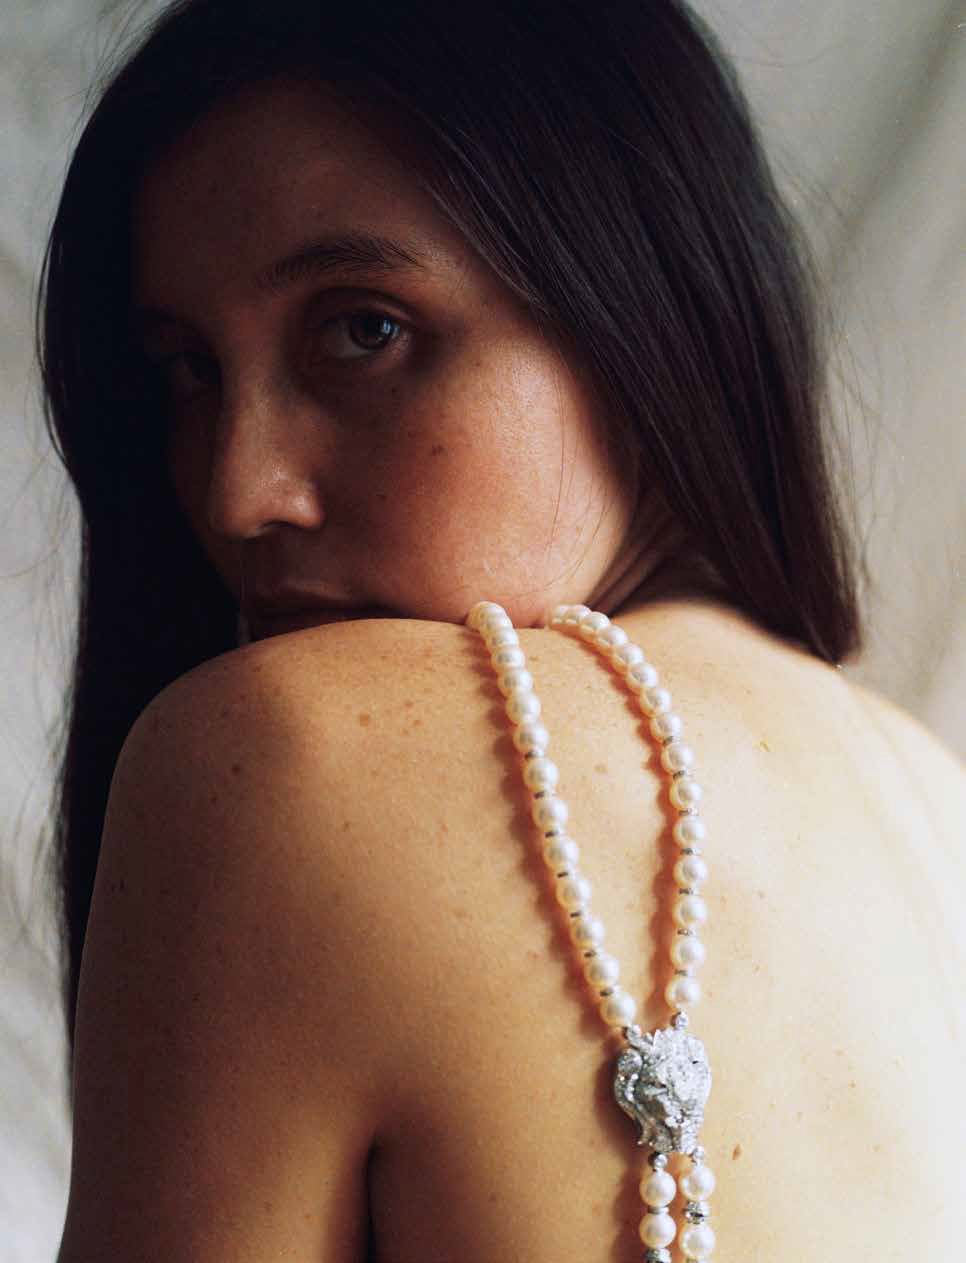 Pg xx Kimbra Chanel Beauty v5-1.jpg